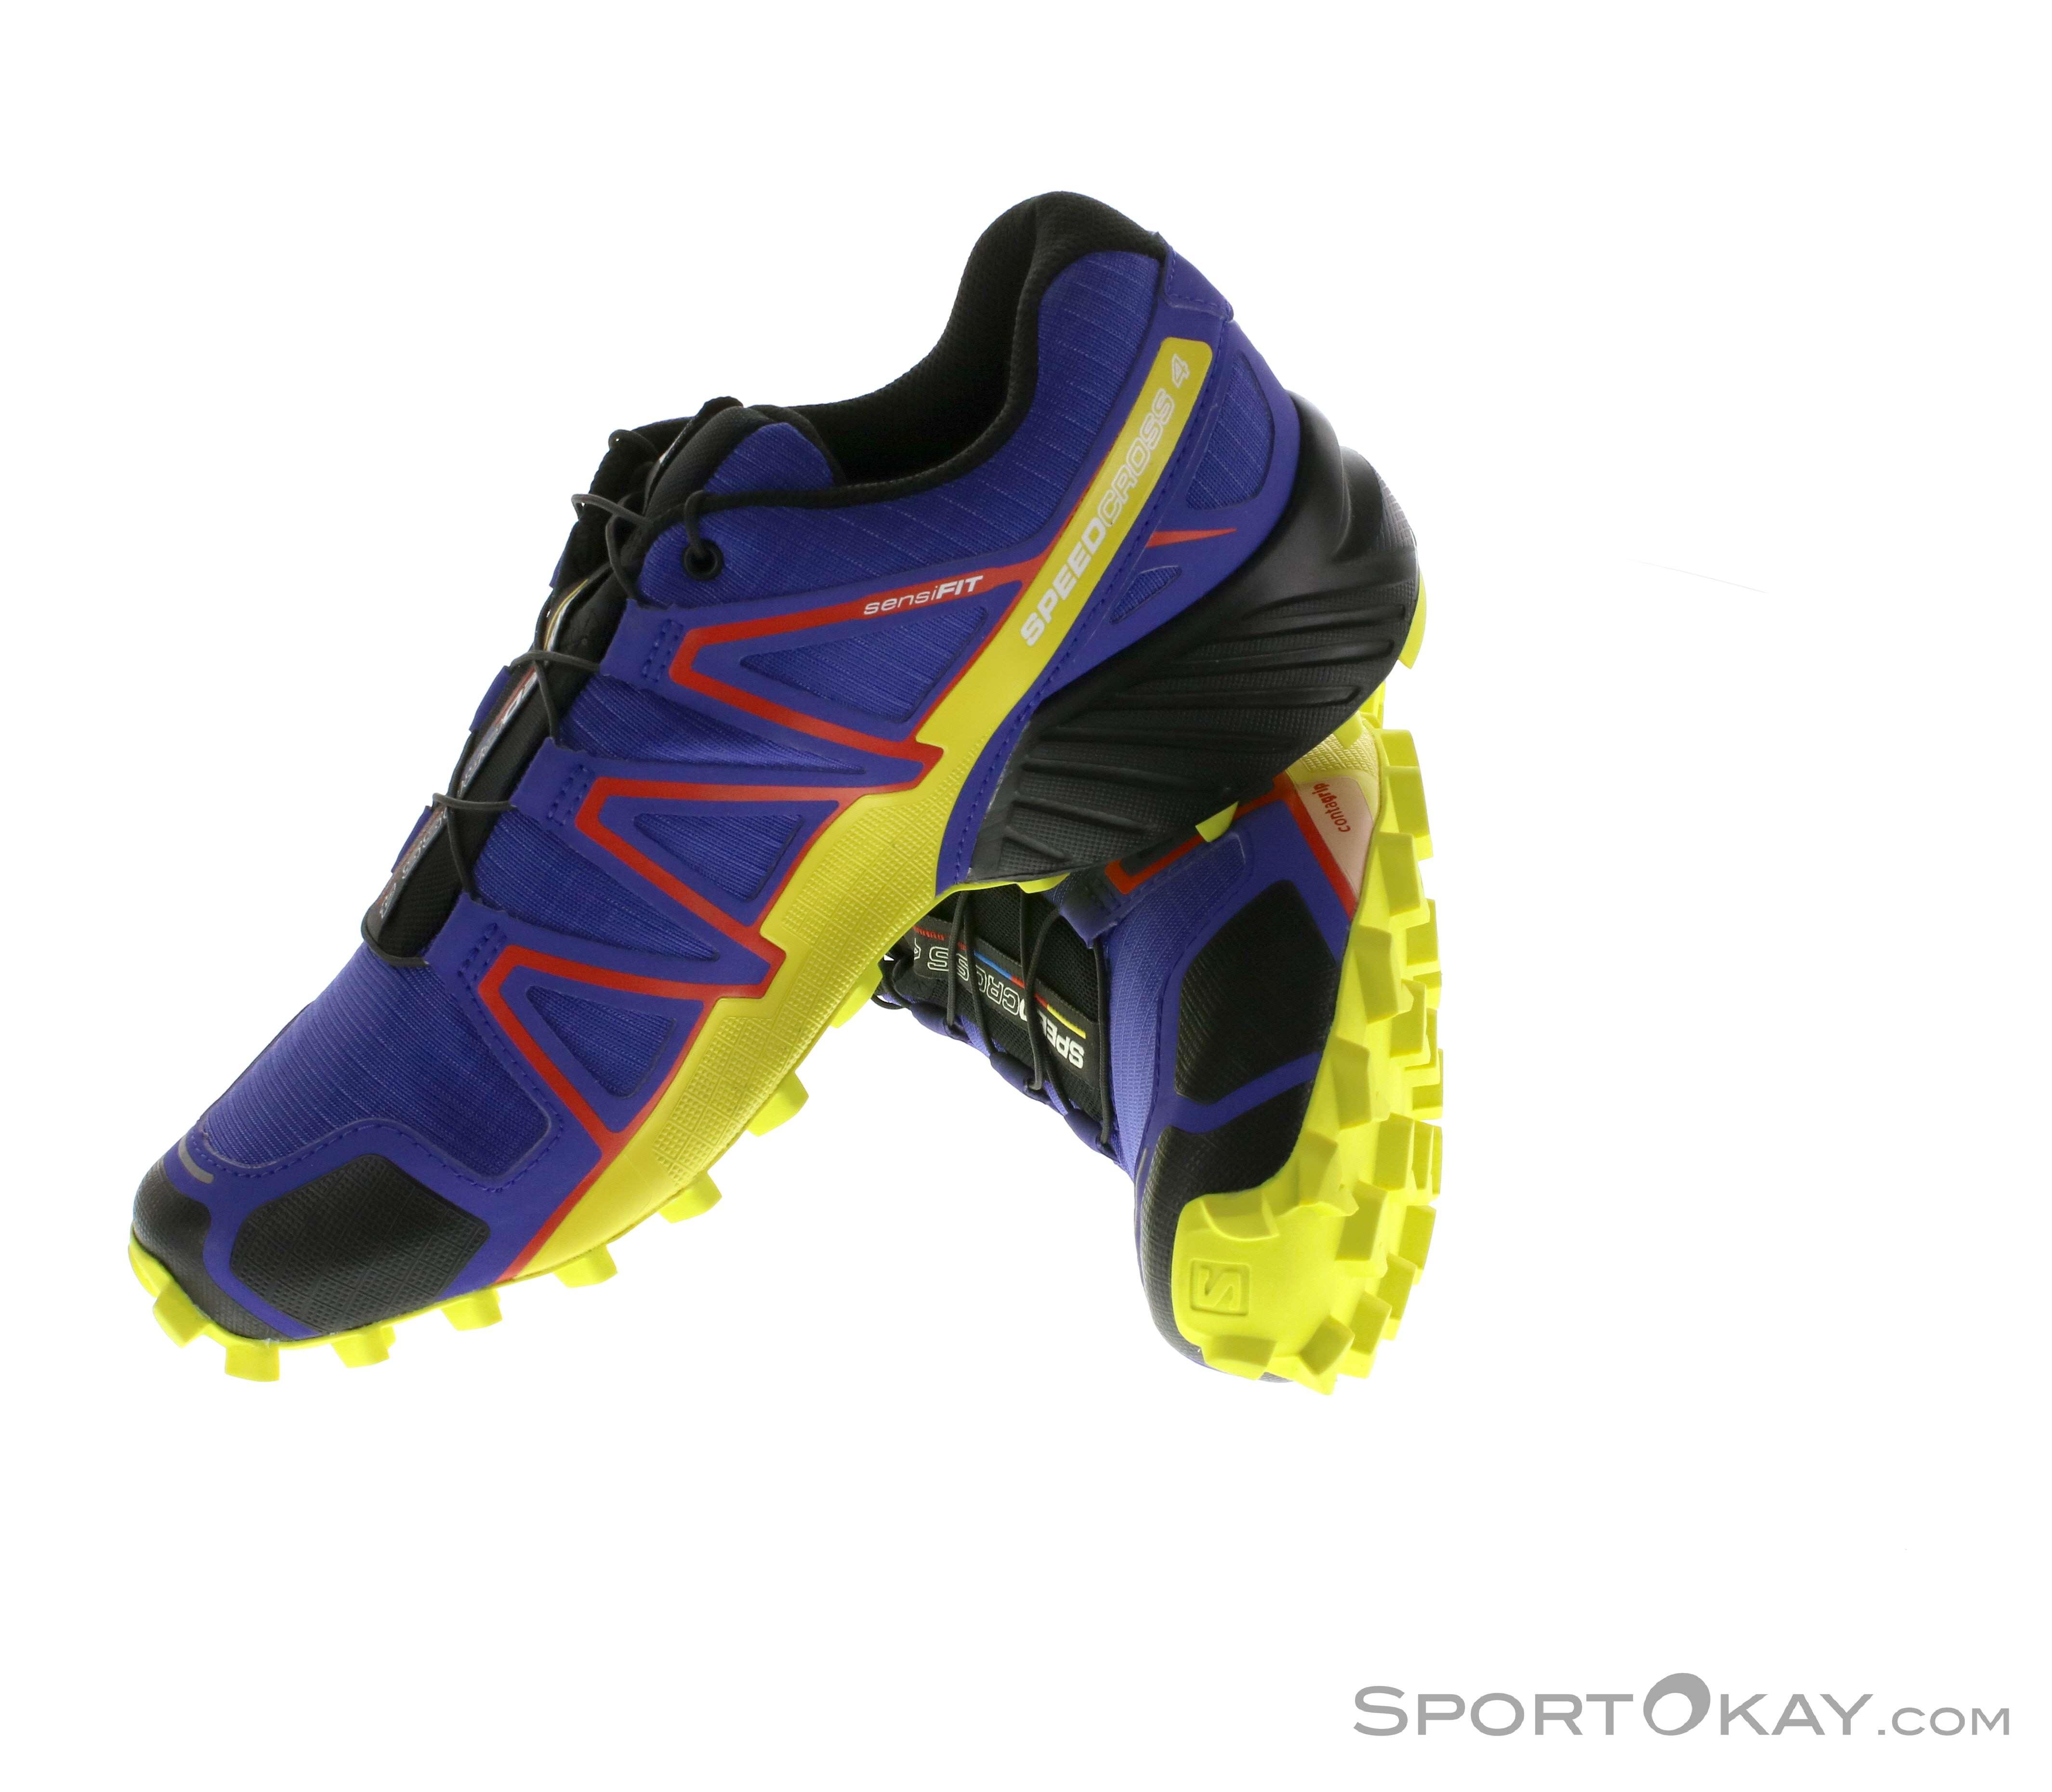 Salomon Speedcross 4 Womens Trail Running Shoes - Trail Running ... bd222c5fe74